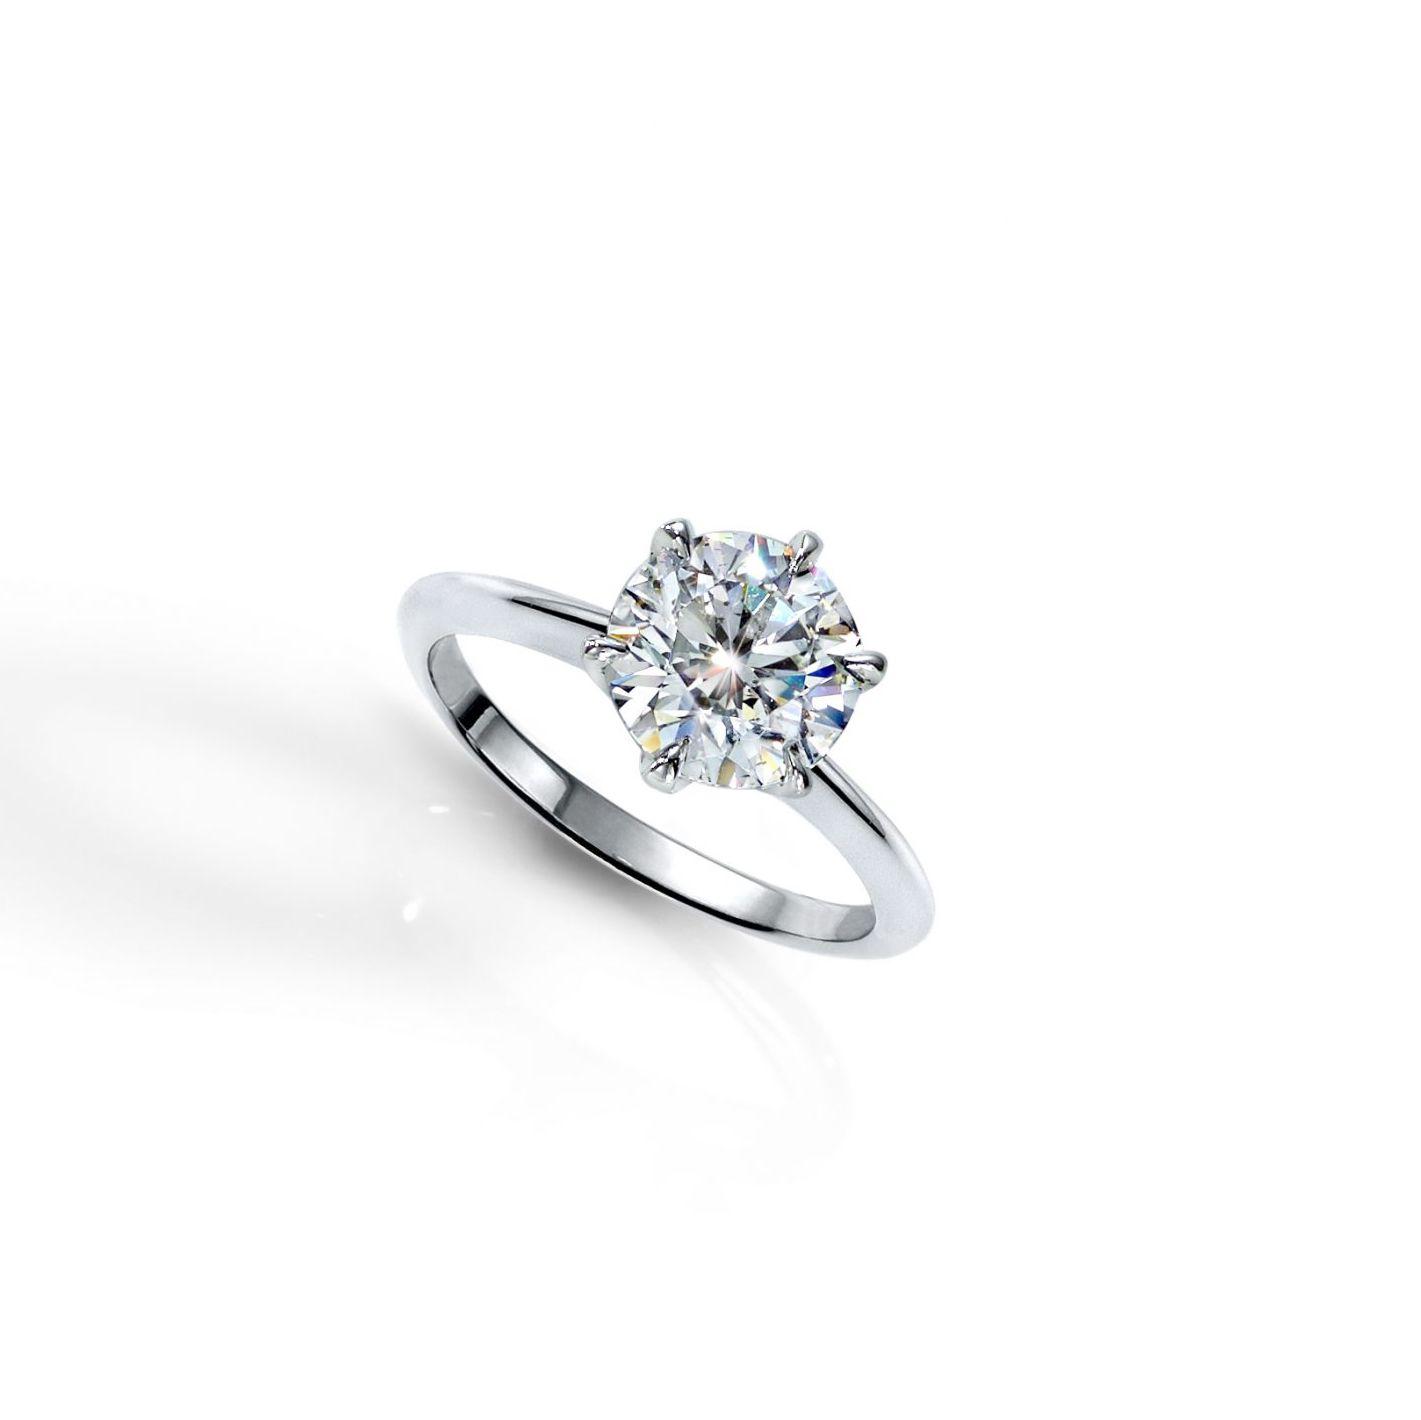 Lauren Addison Knife-Edge Brilliant-Cut Diamond Solitaire Ring